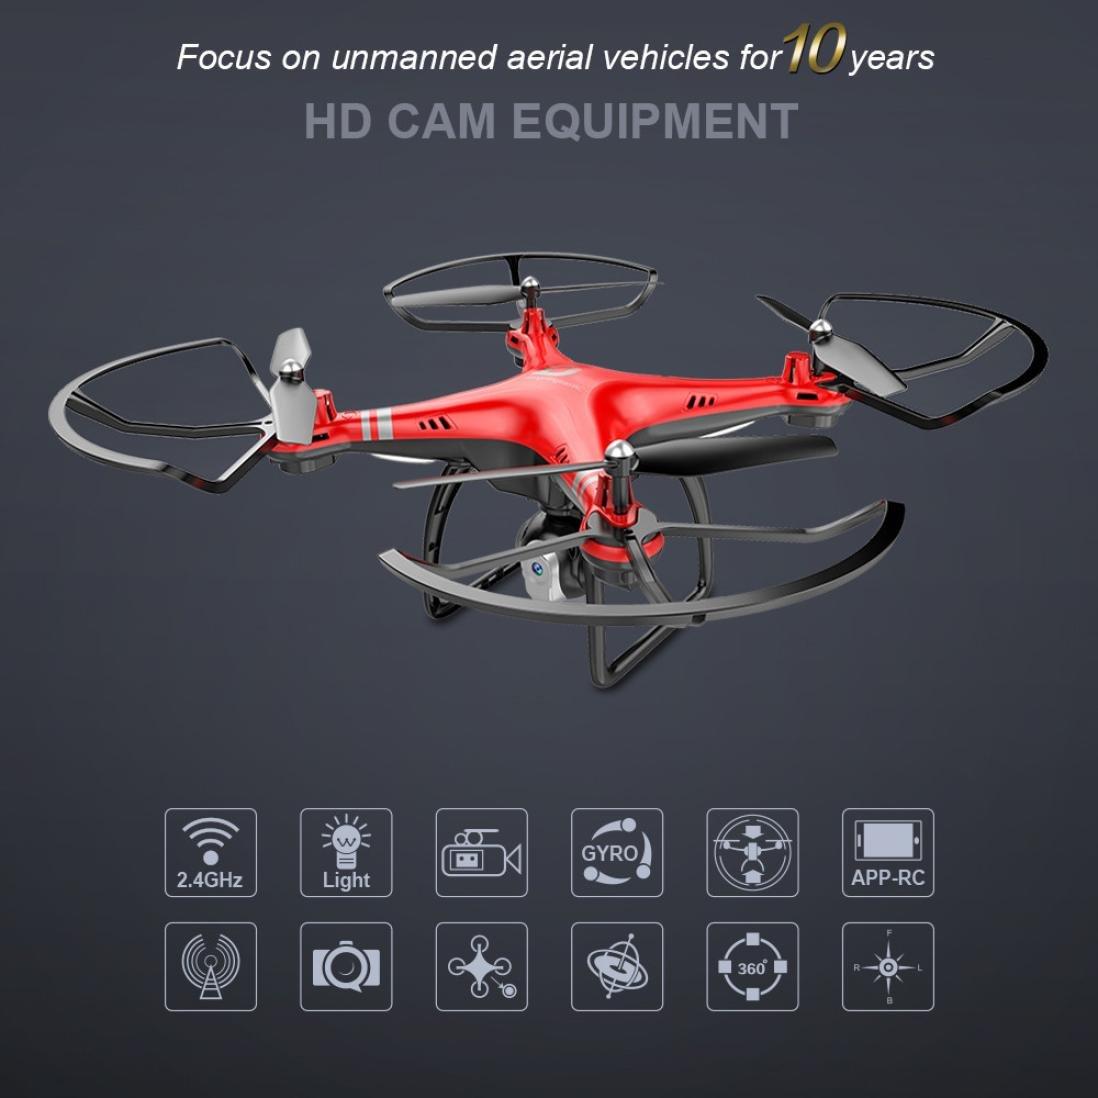 GJKK x8 2.4G RC Quadcopter Quadcopter Quadcopter Strom Anpassung 0.3MP HD Kamera RC Drone FPV Ferngesteuerte Flugzeuge Mini Drone Quadcopter Drone Fliegendes Spielzeug Tragbare Drohne Draussen Drohne-Schwarz/Rot (Rot) 0a6fed